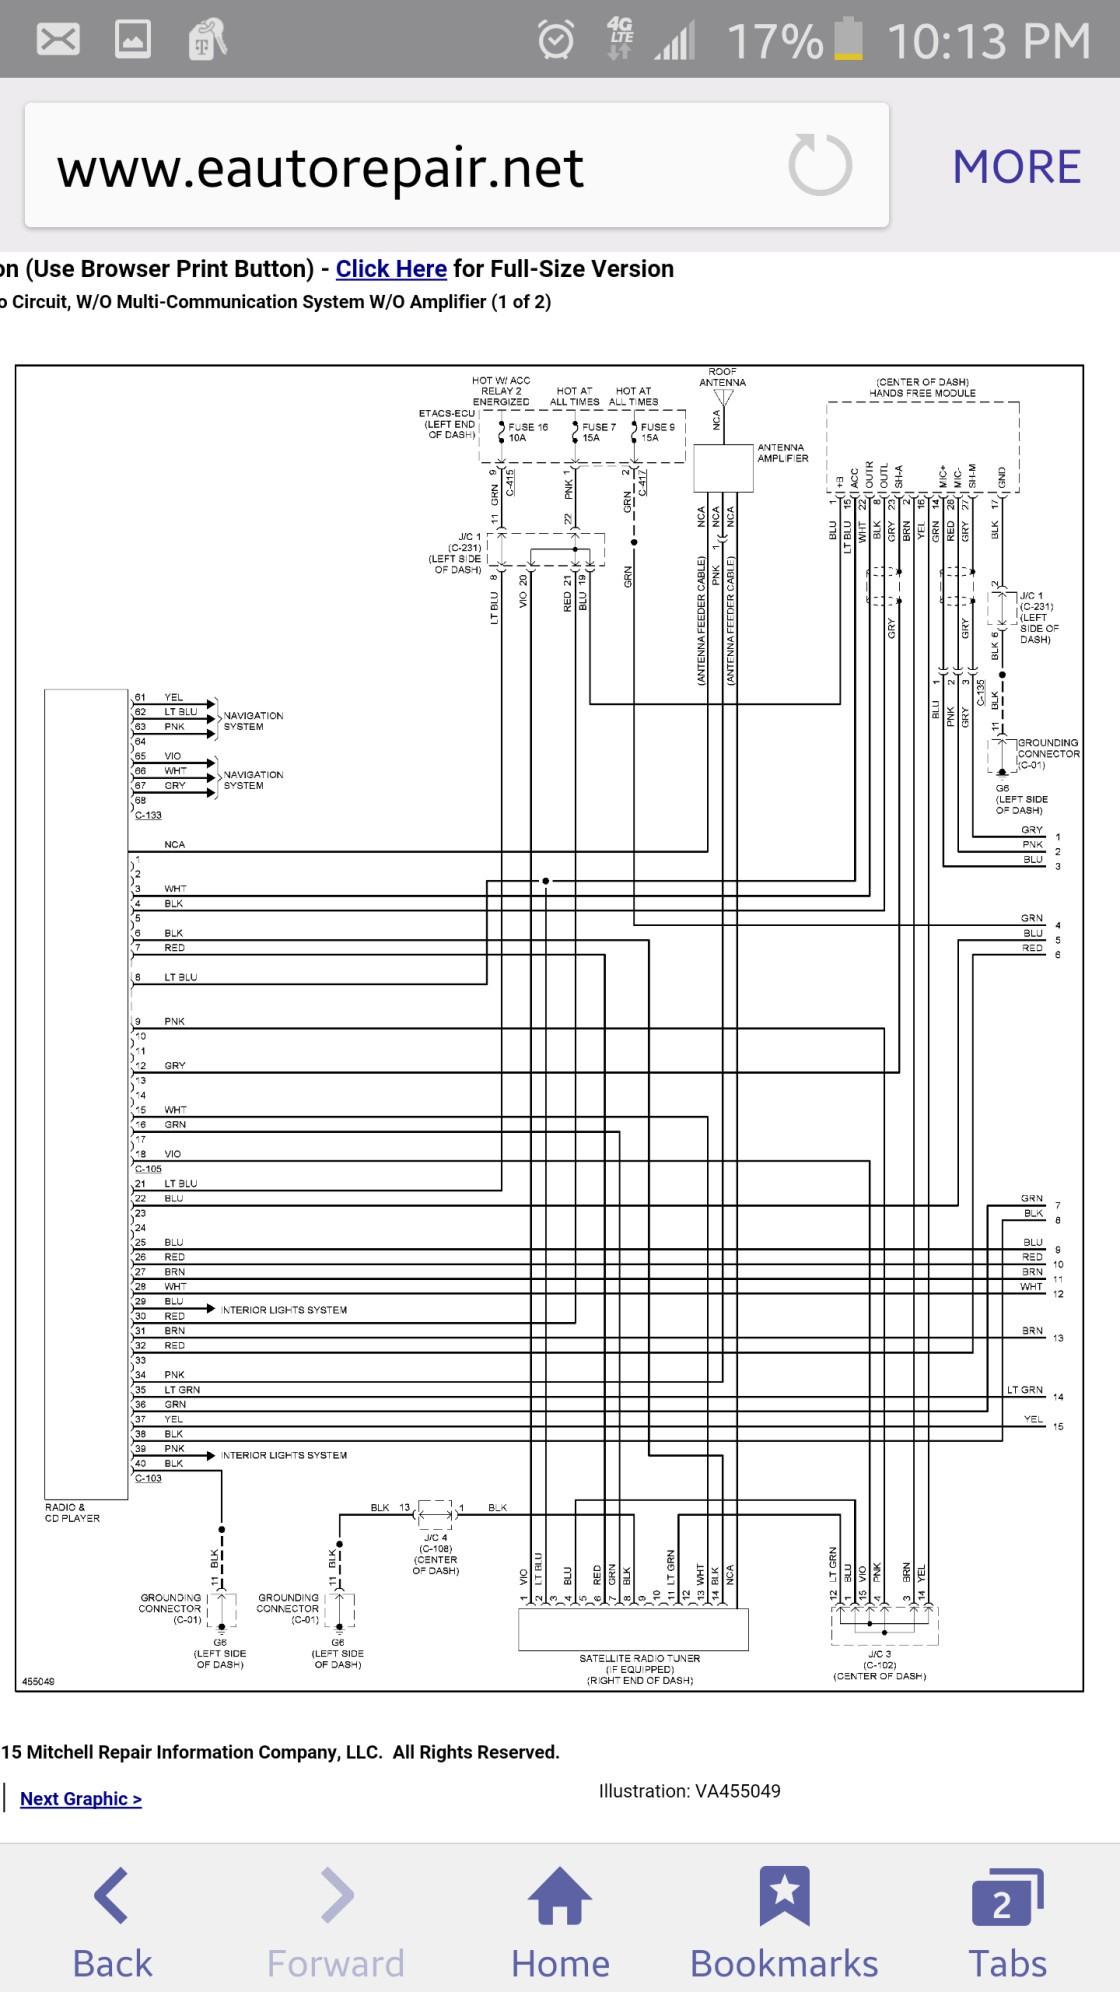 Mitsubishi Eclipse Wiring Diagram Speaker Color Code Mitsubishi Eclipse Radio Wiring Diagram Oceania Of Mitsubishi Eclipse Wiring Diagram